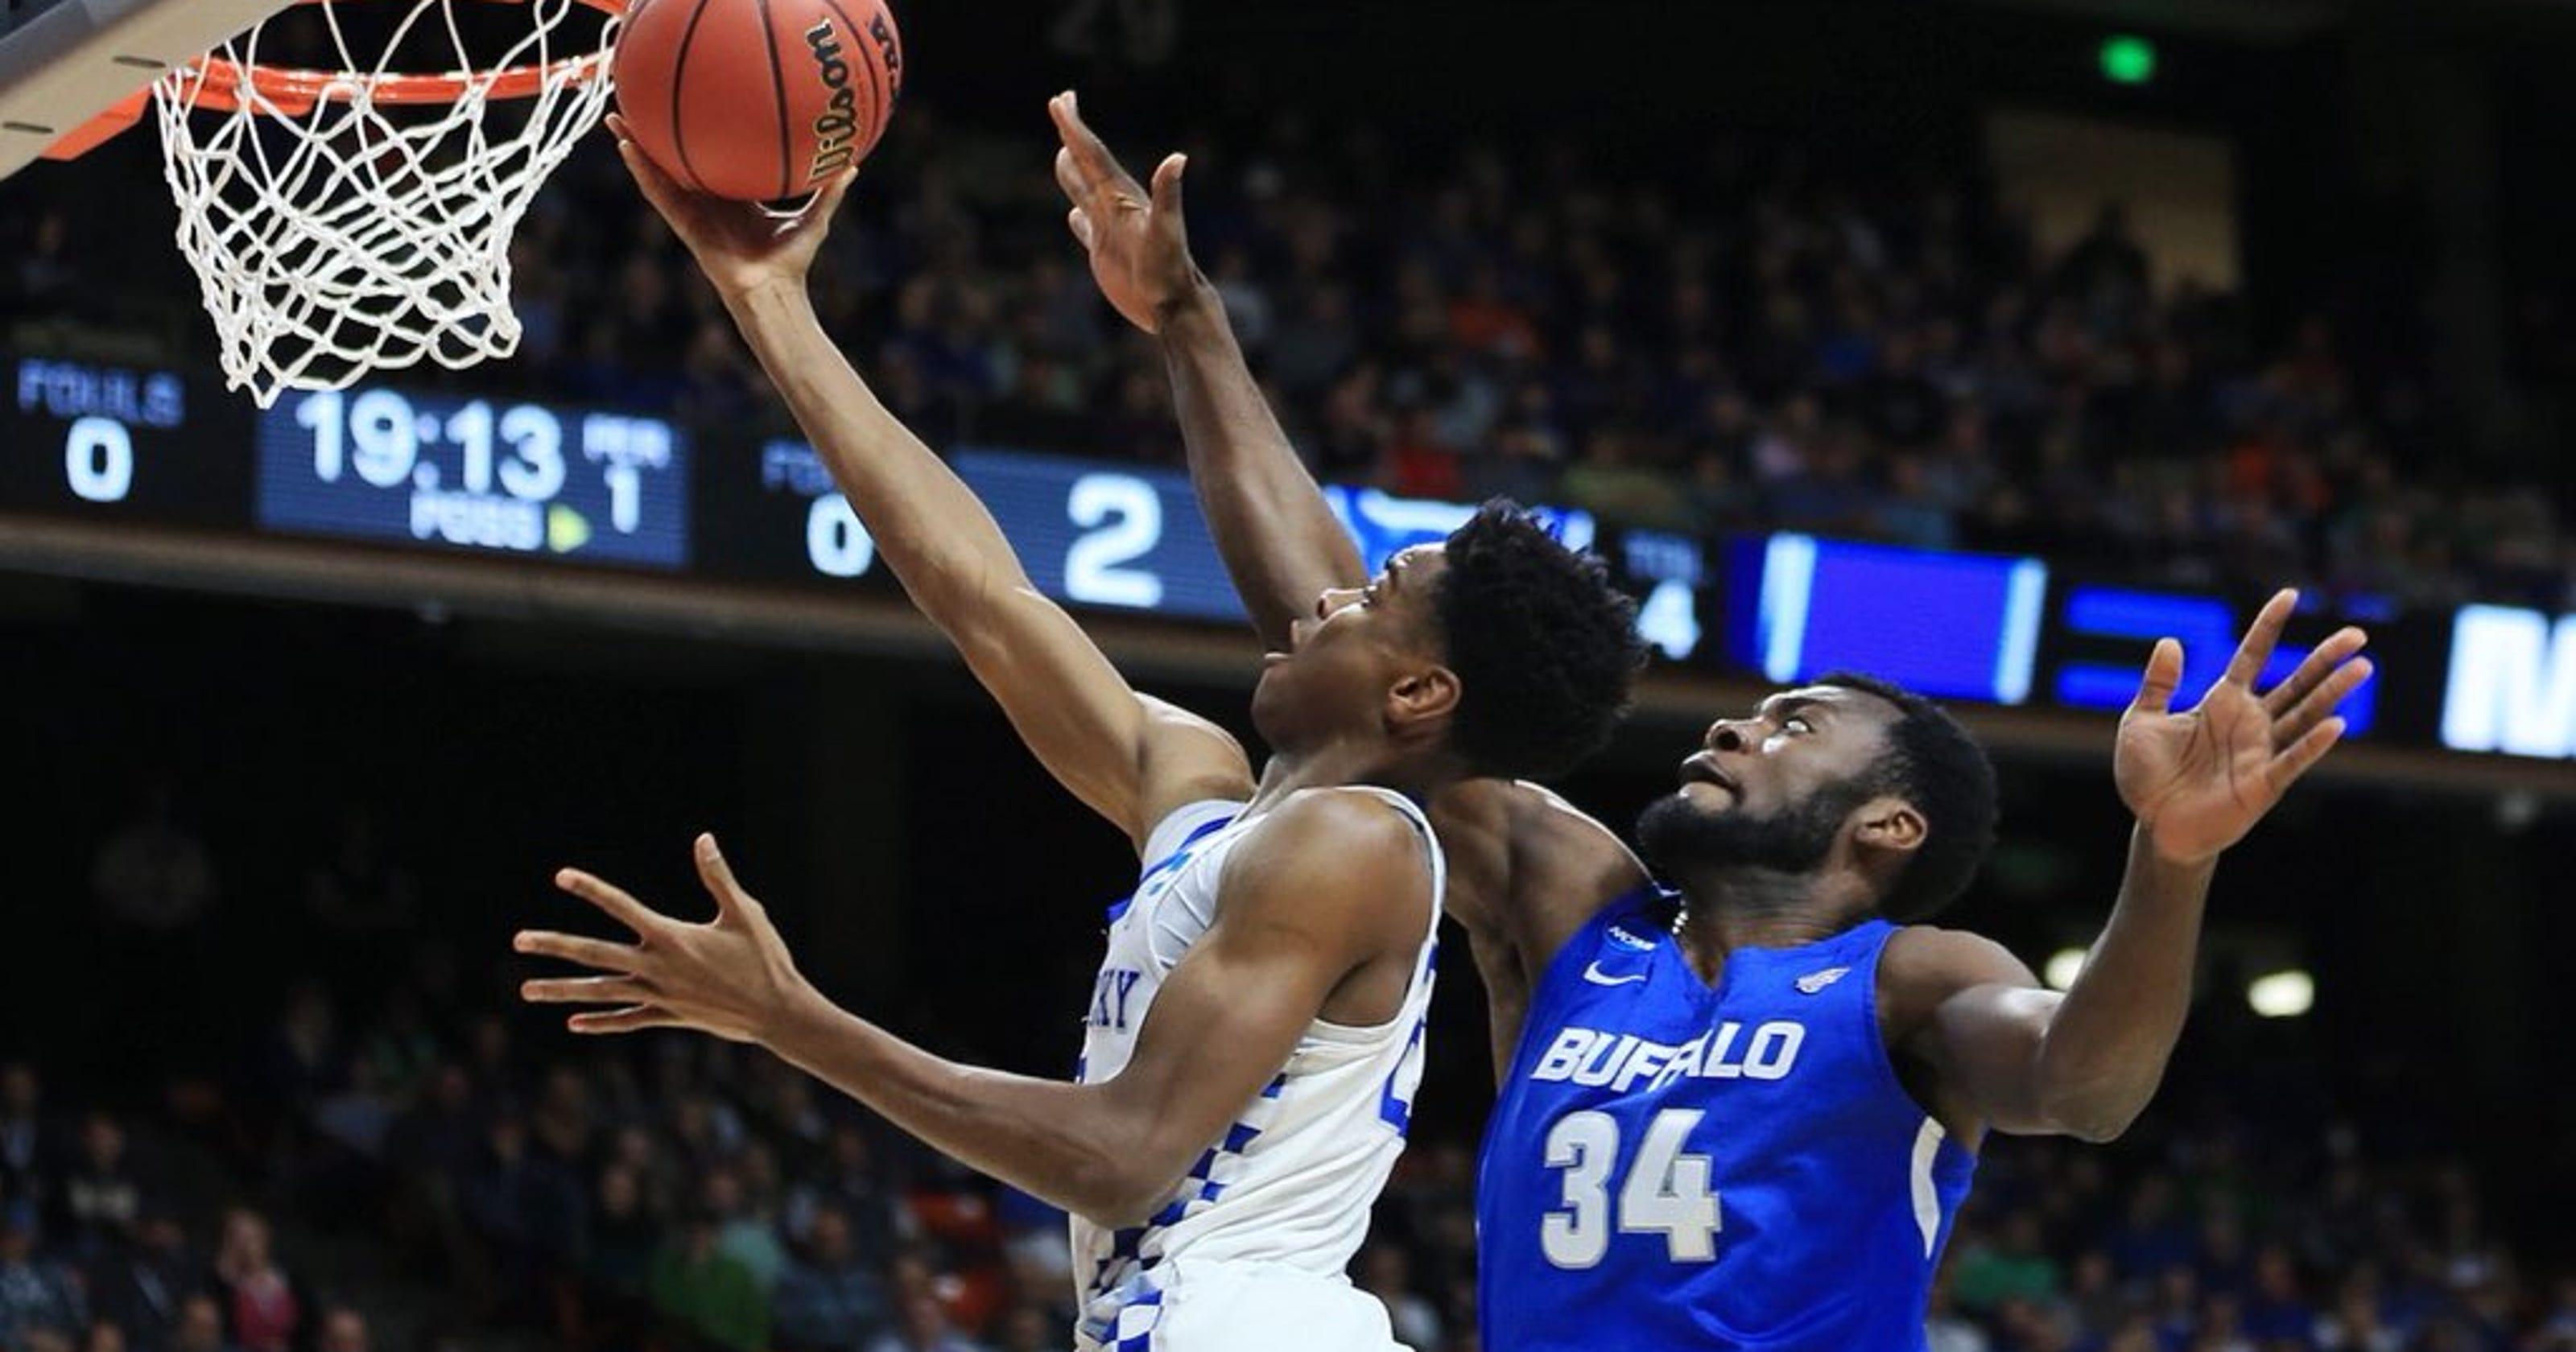 1717e356ff62 Kentucky basketball moves into NCAA Tournament Sweet 16 with win against  Buffalo